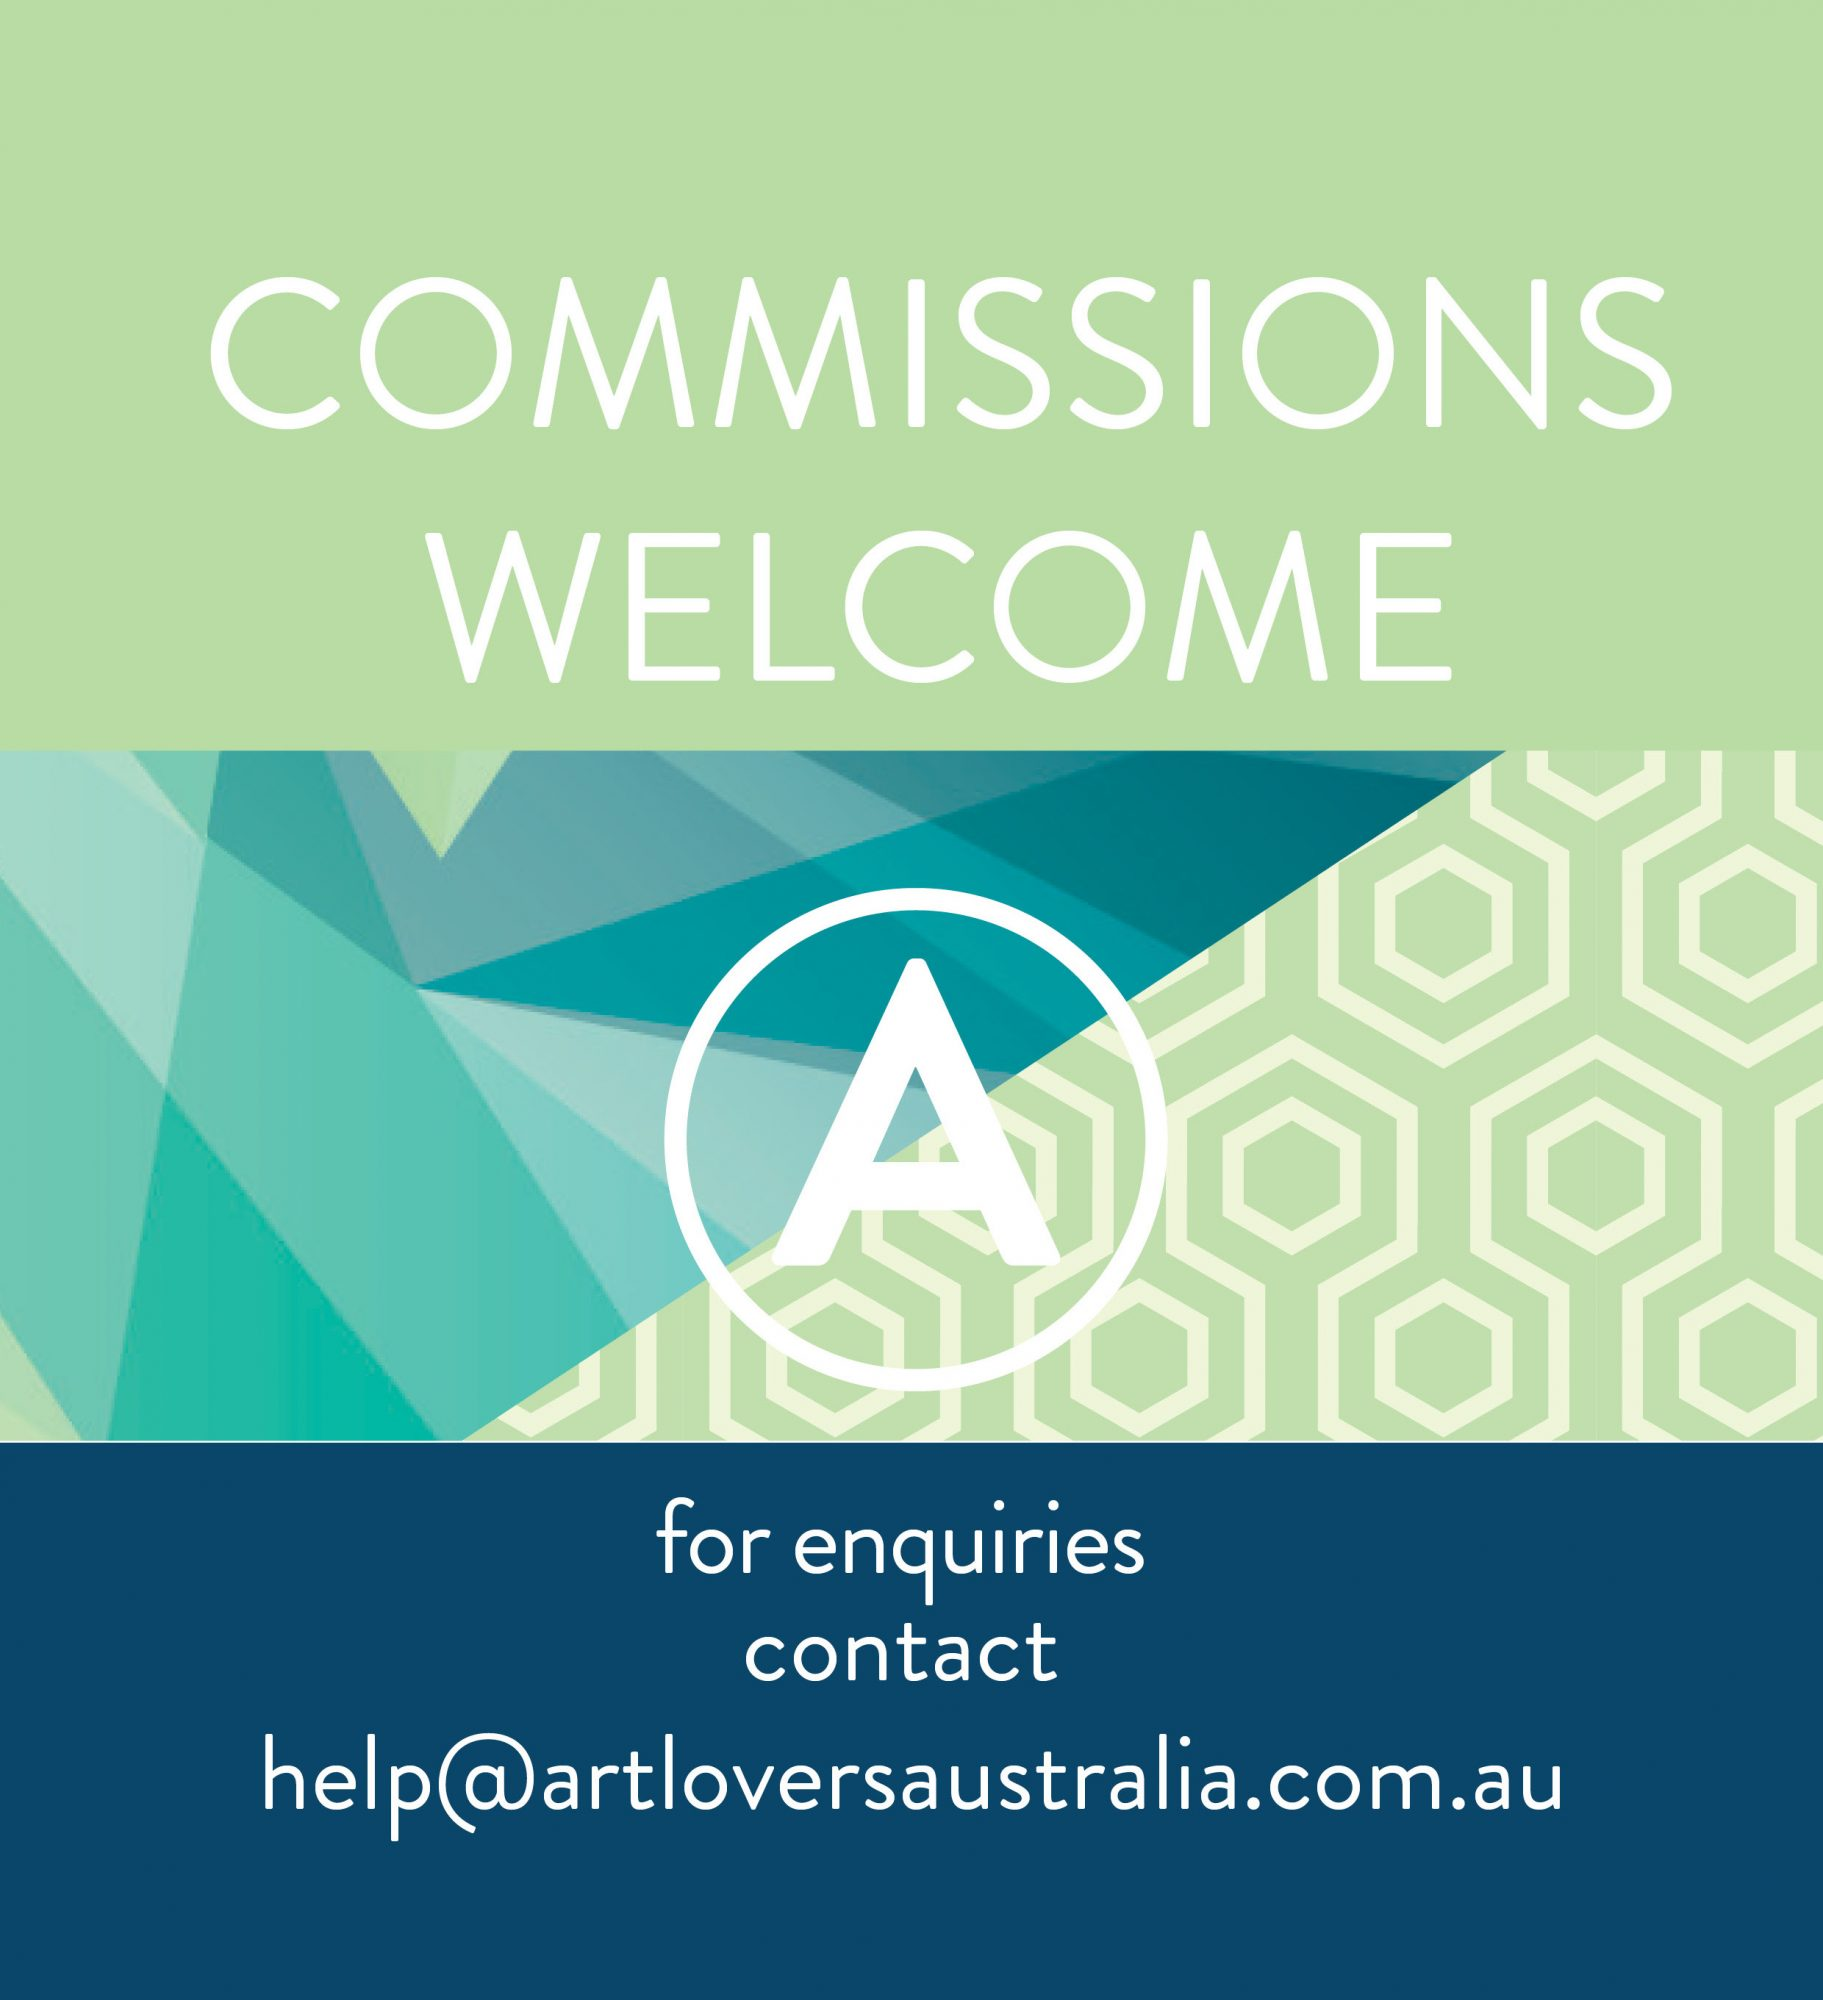 Commissions Help